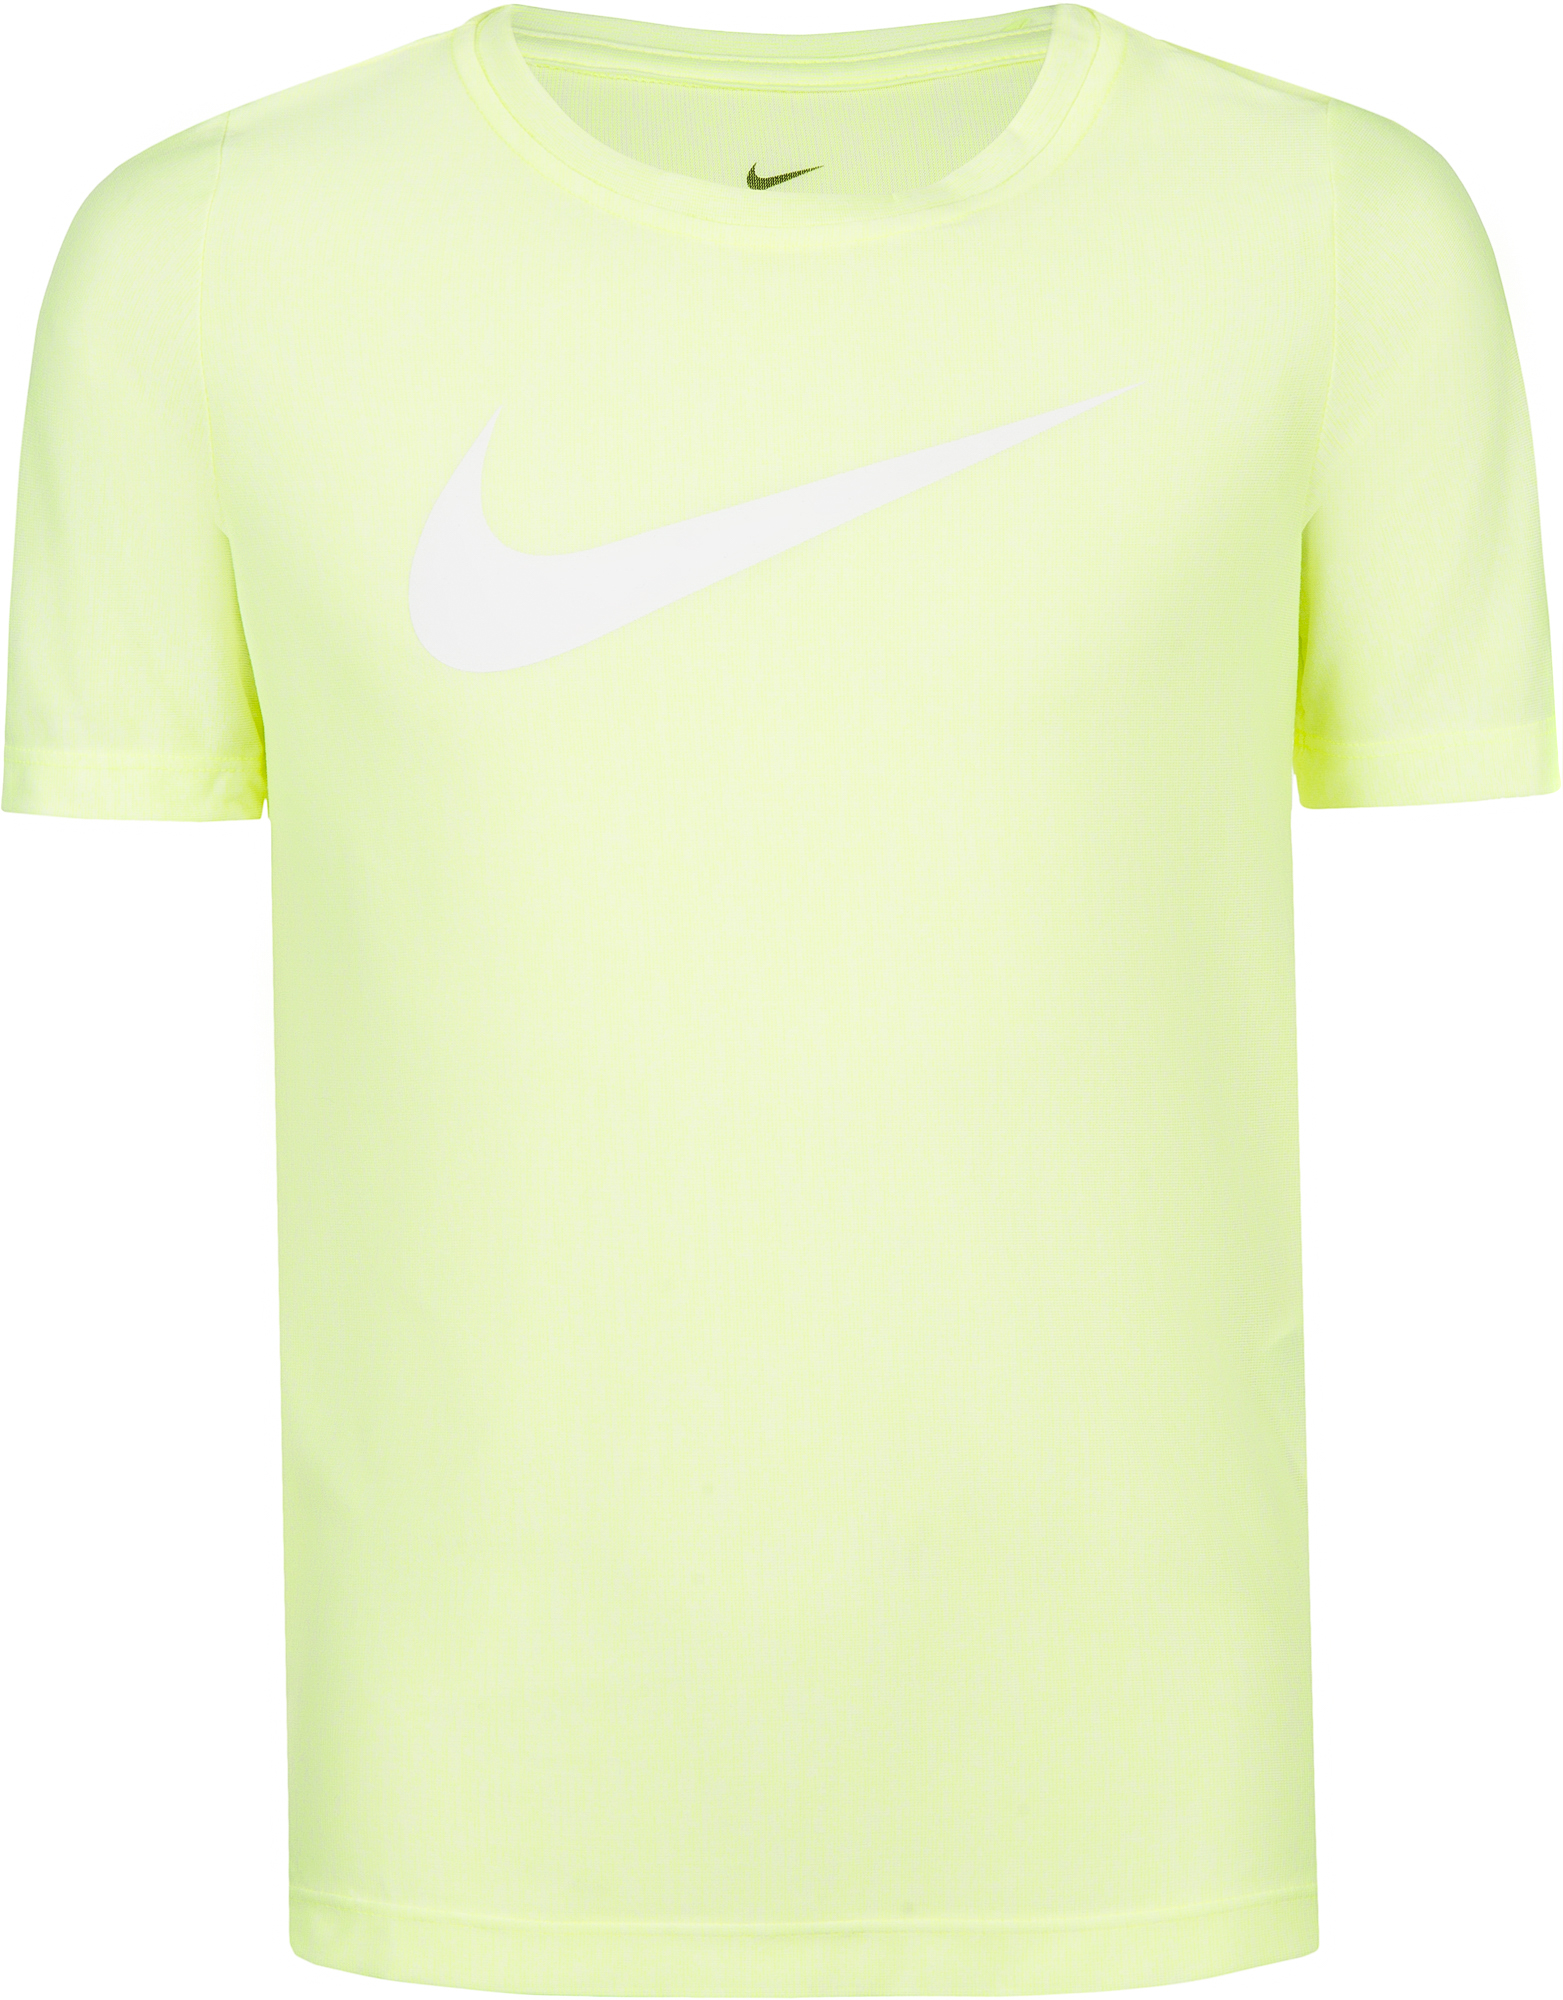 Nike Футболка для мальчиков Nike Dry, размер 137-147 nike футболка для мальчиков nike geo basketball